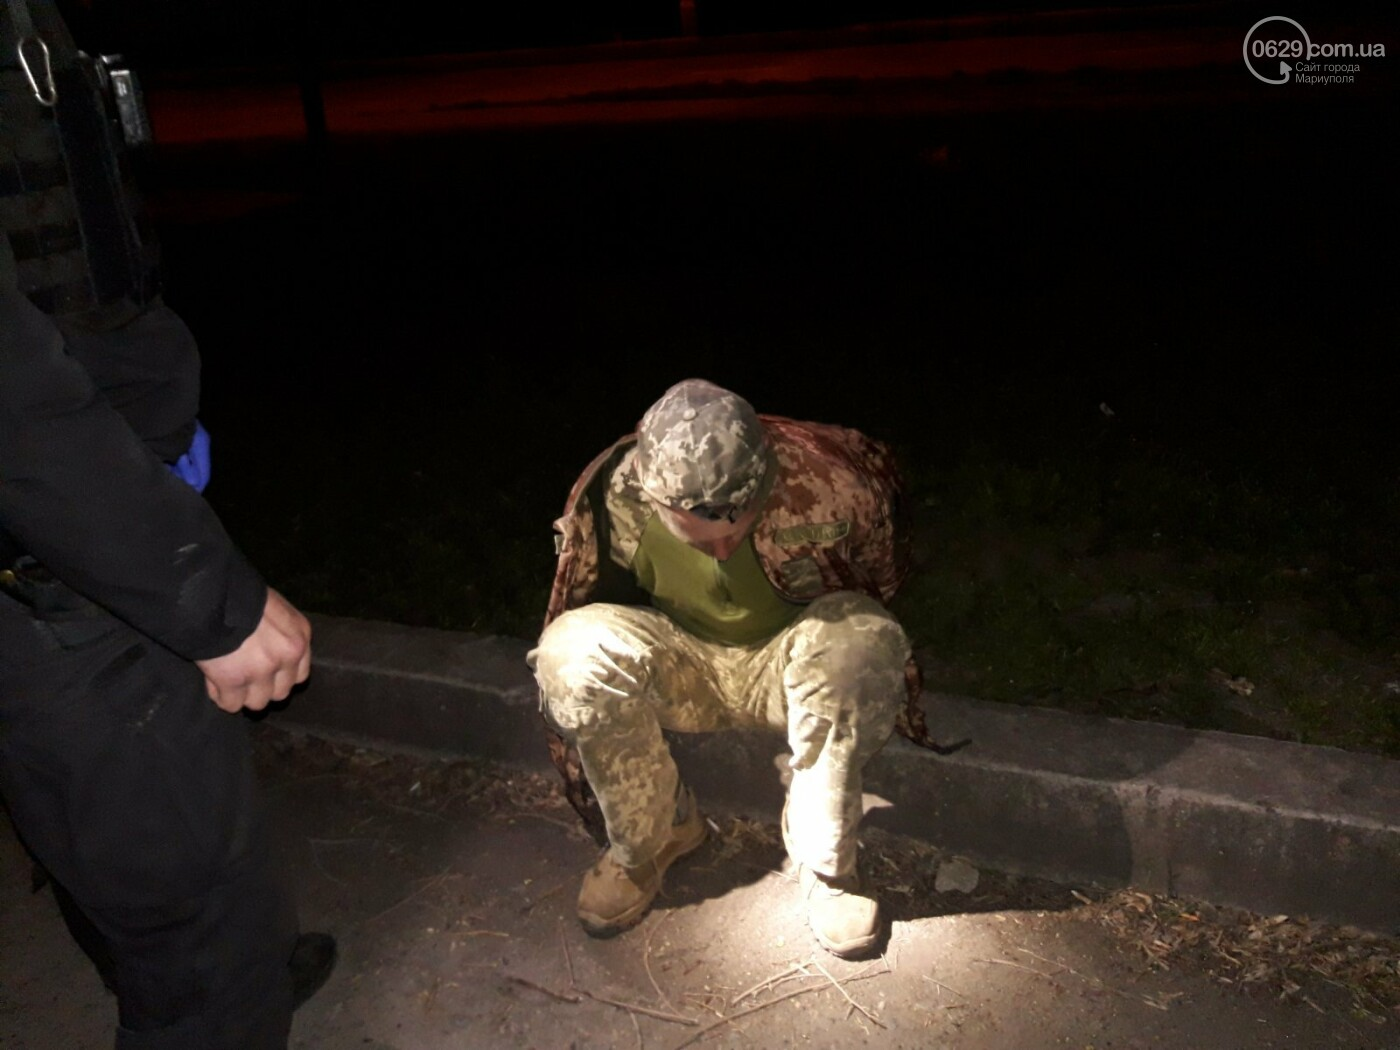 В Мариуполе задержали военного под кайфом с наркотиками в кармане, - ФОТО, фото-1